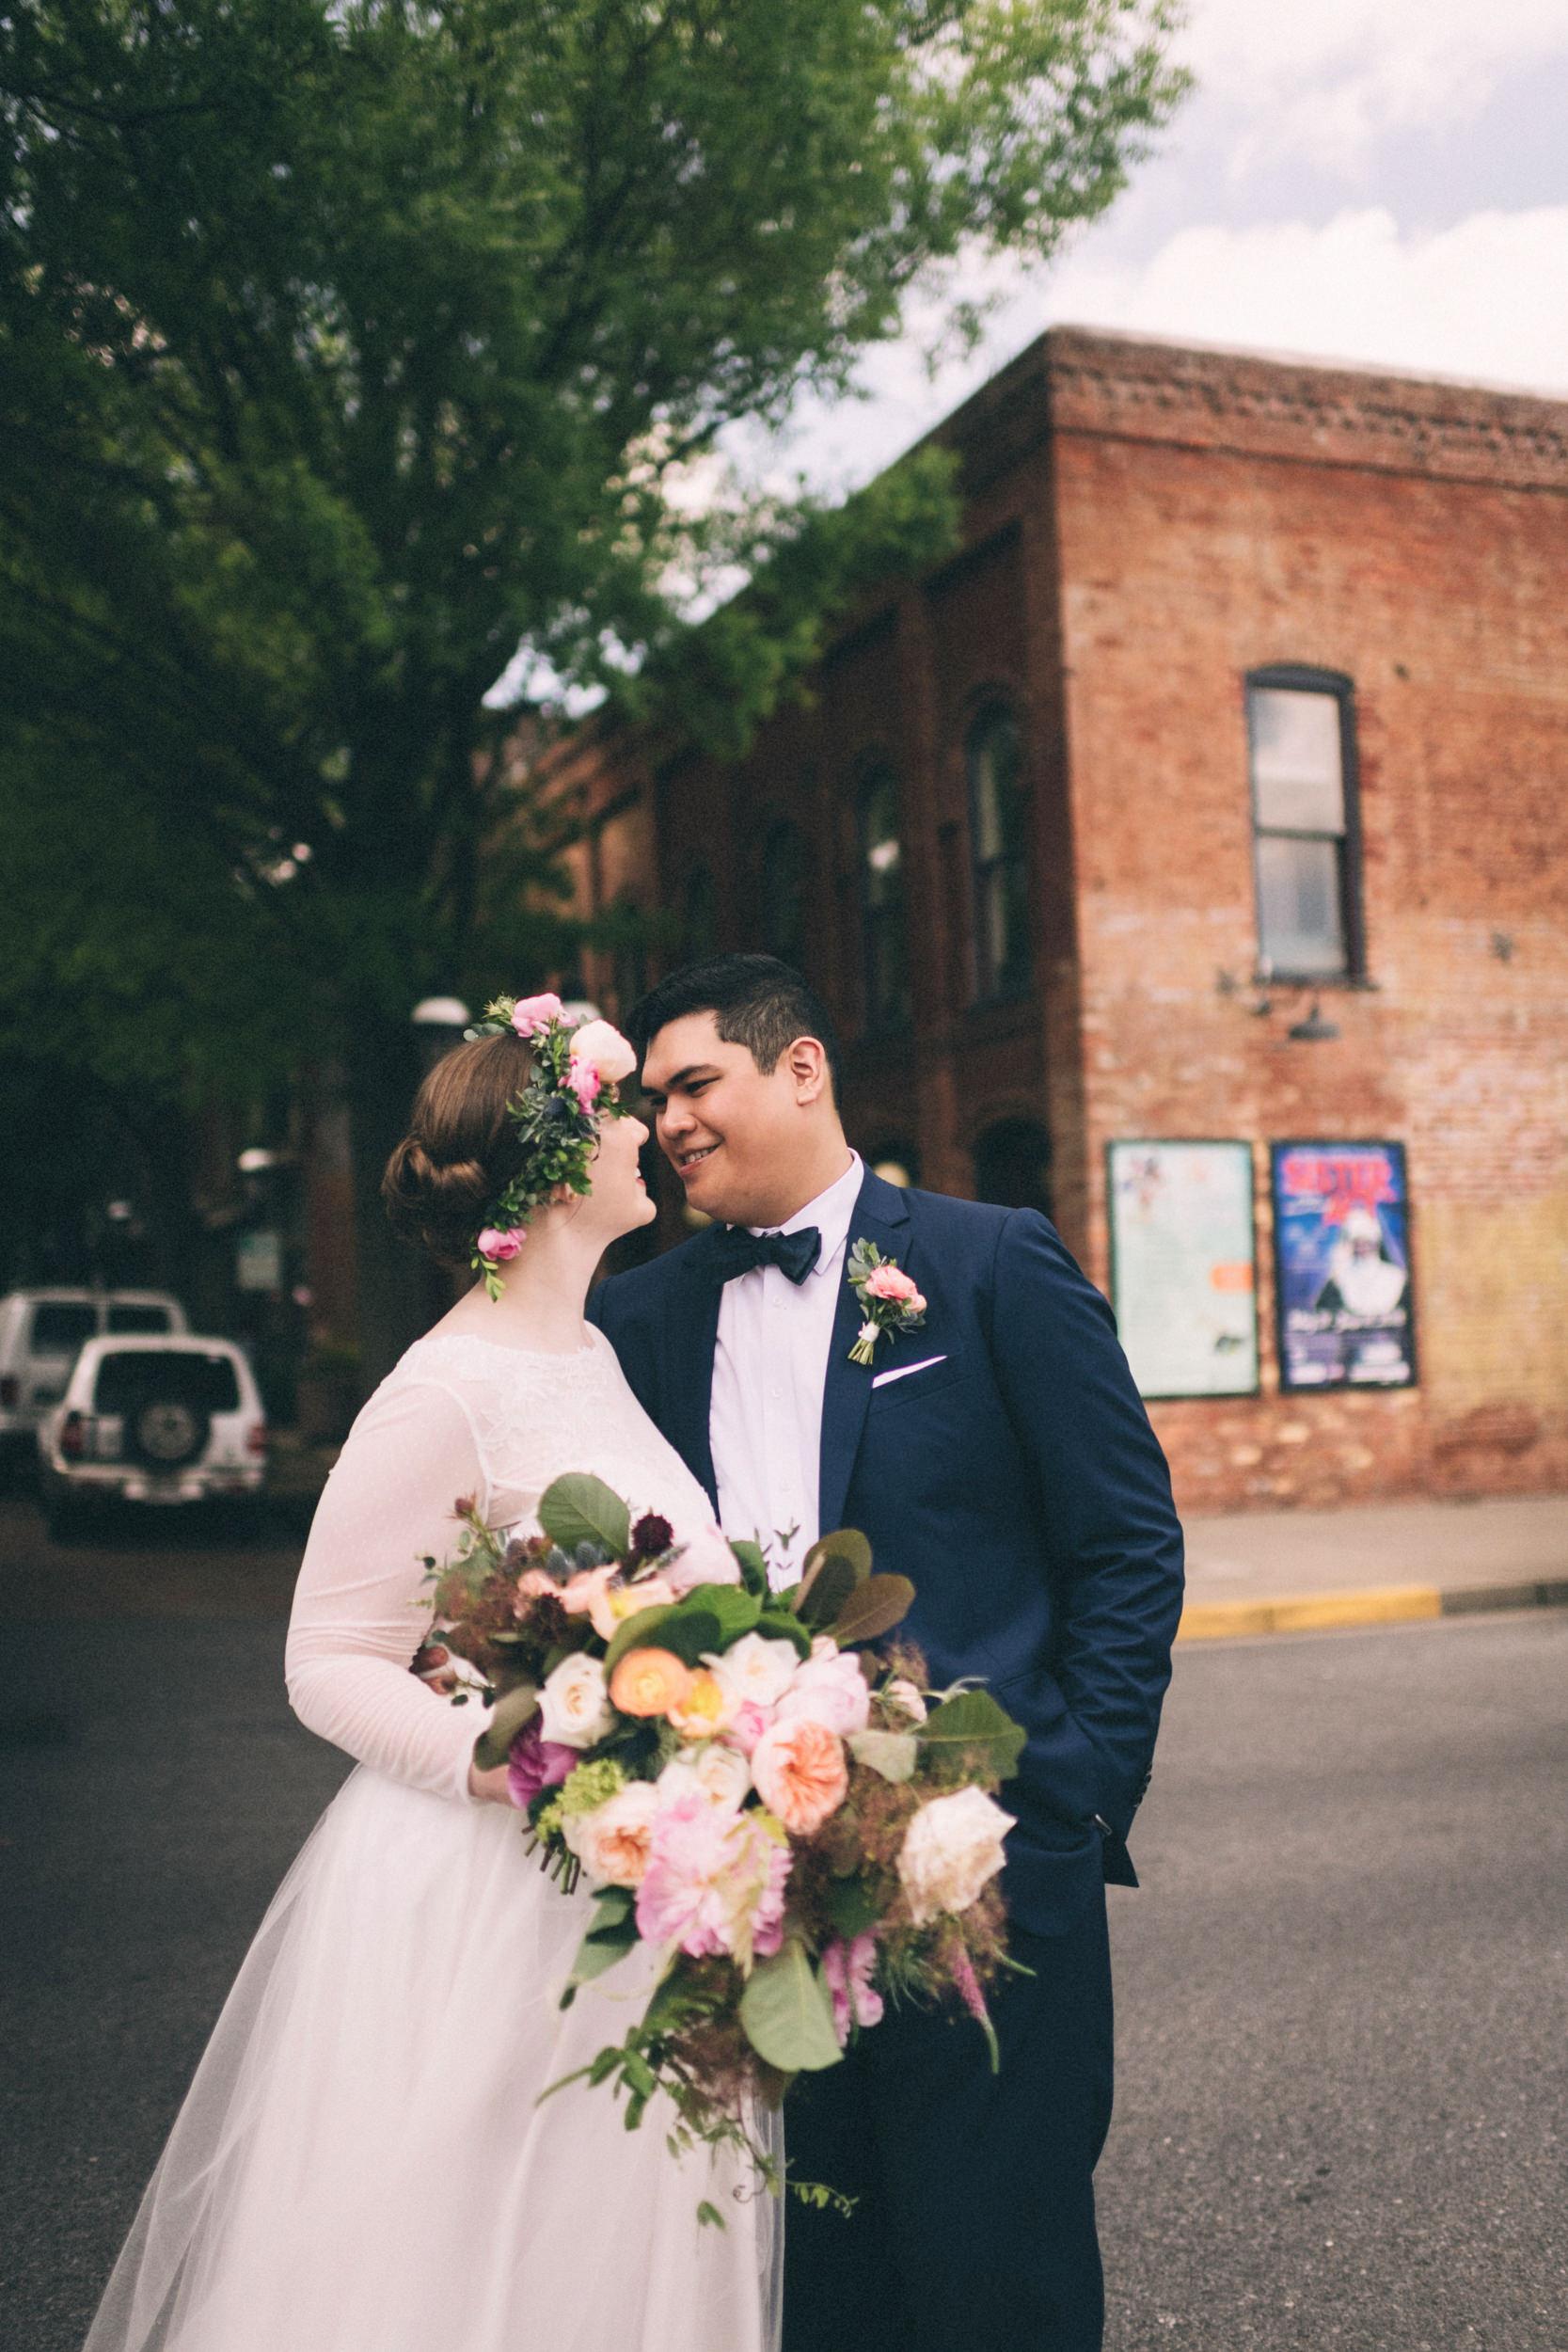 lauren-dean-wedding-grand-lodge-kentucky-sarah-katherine-davis-photography-237edit.jpg